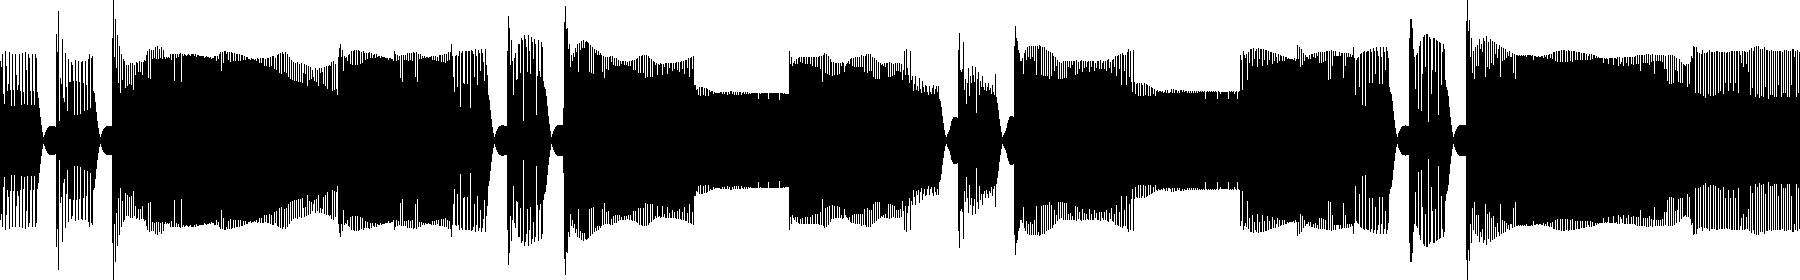 mc09 acid bassline04 115 cm